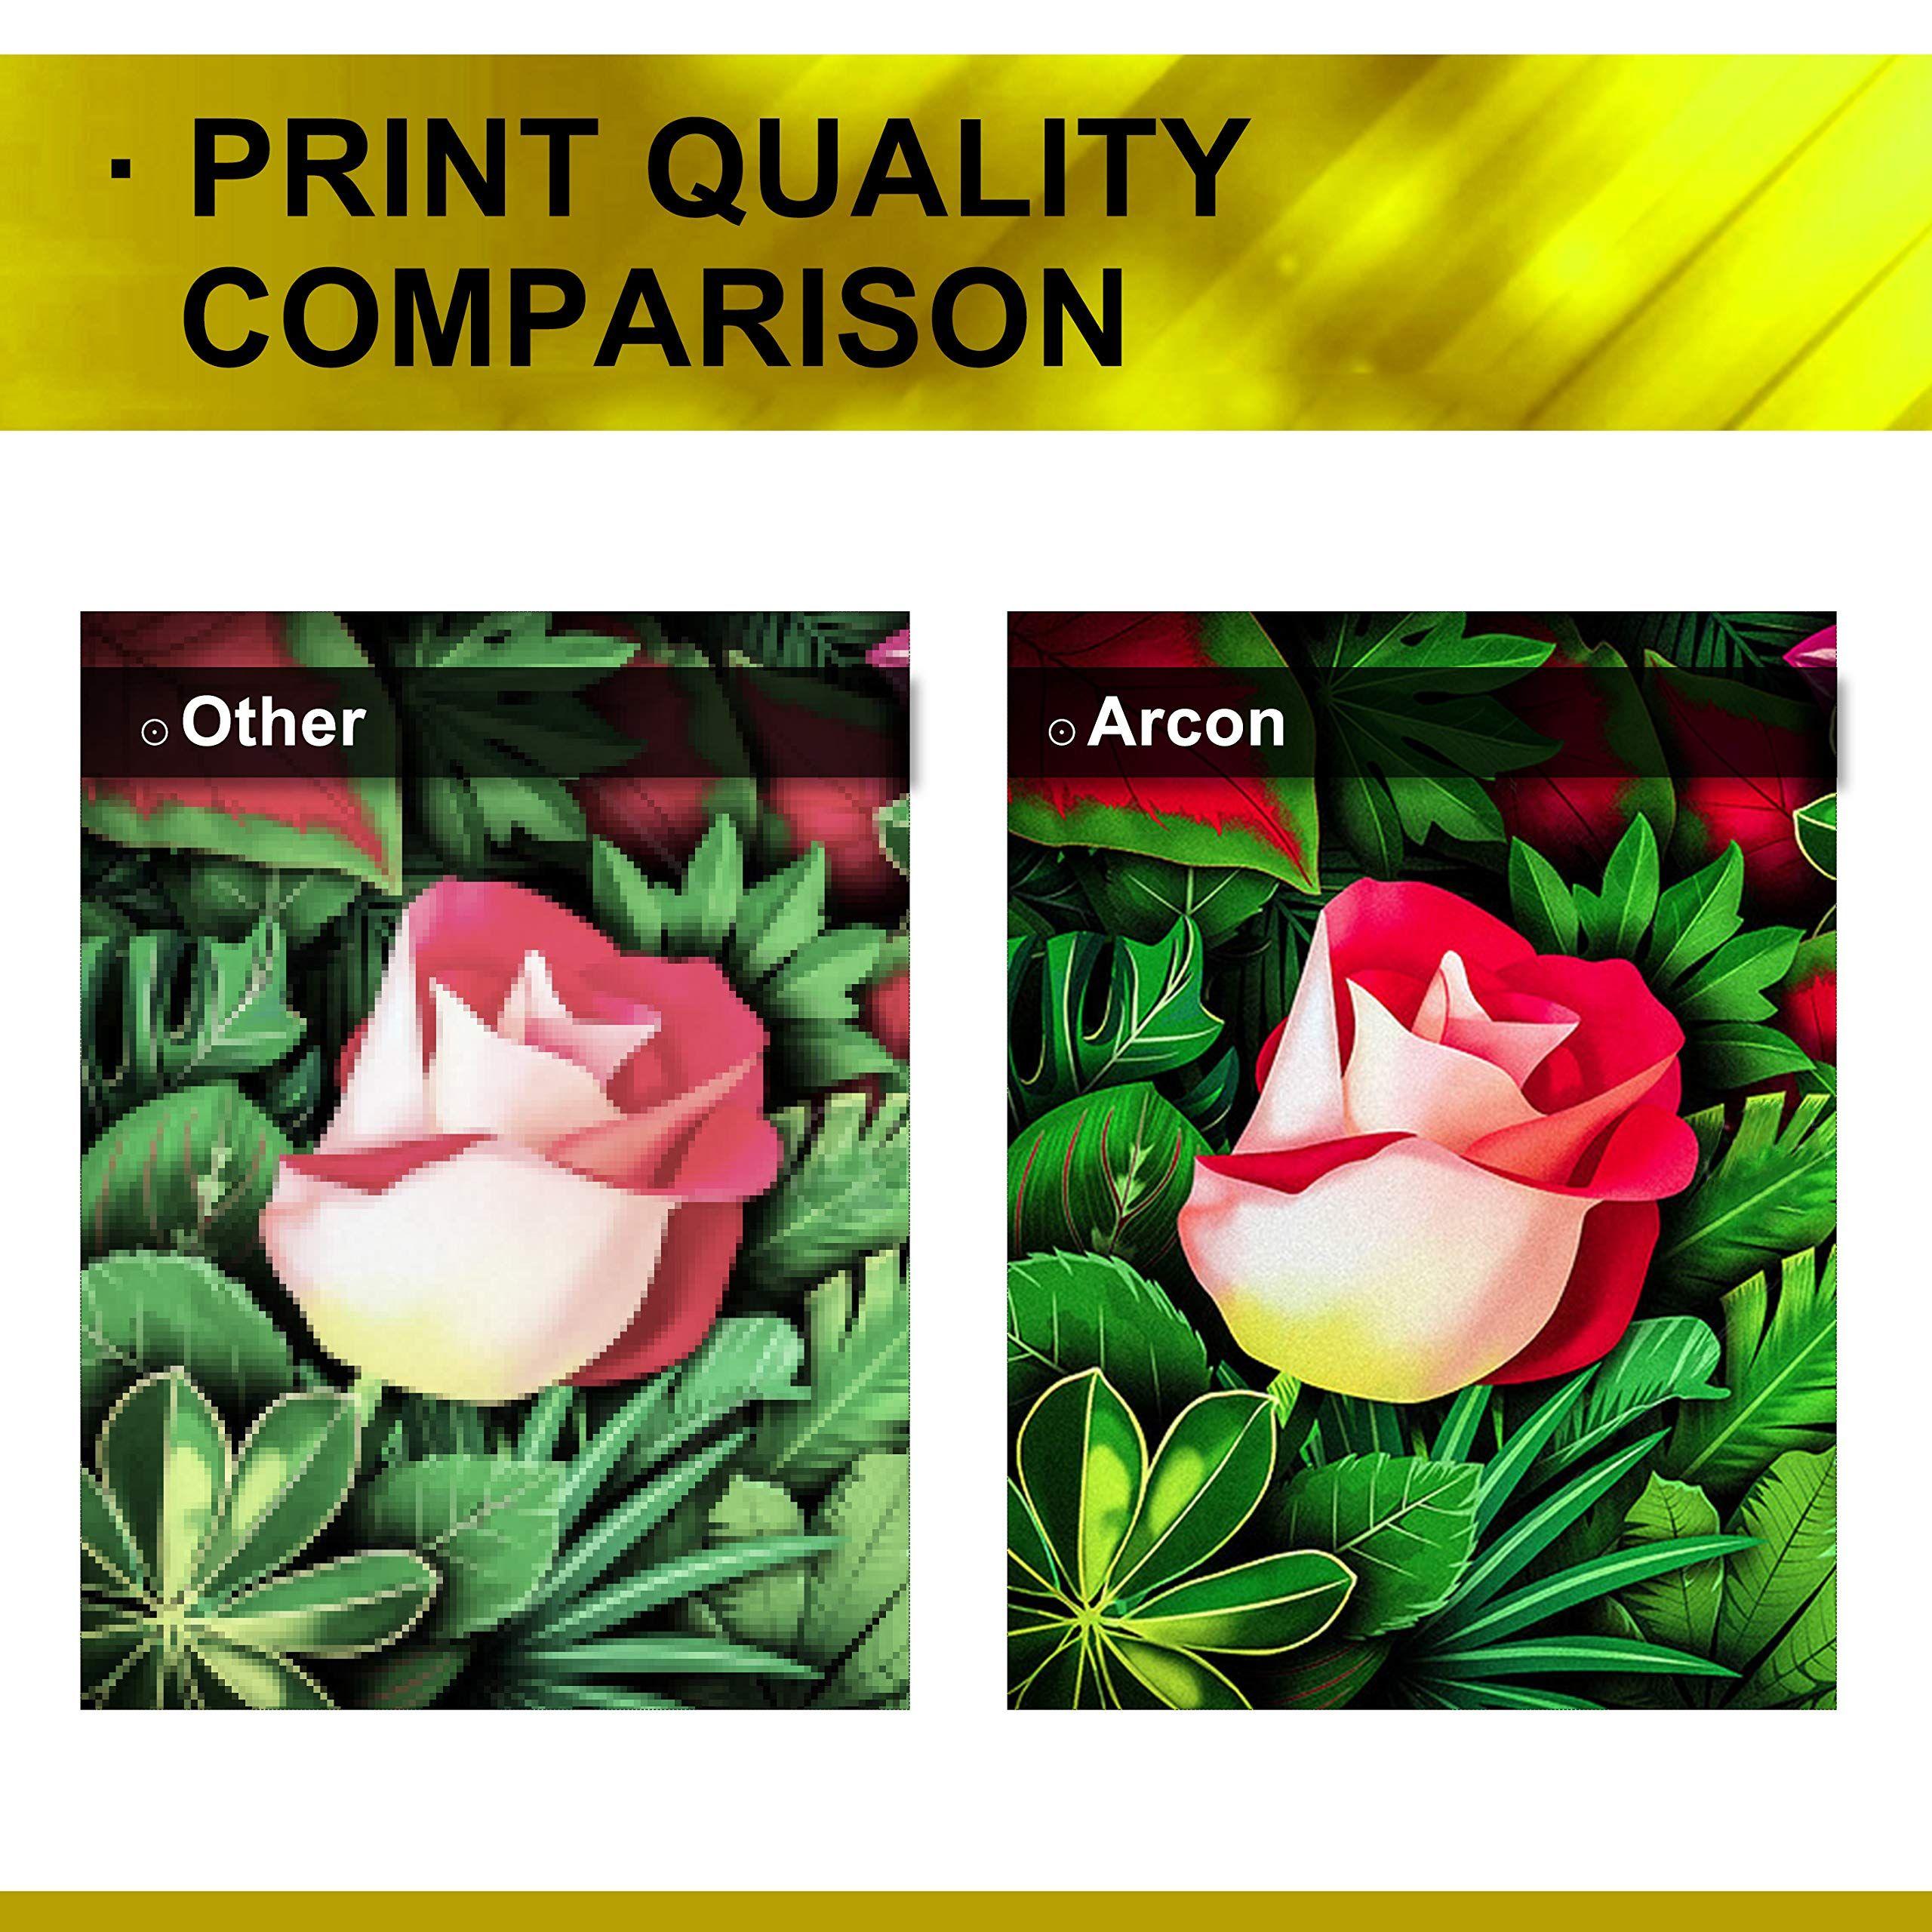 Arcon 4 Pack Compatible For Hp 410a Cf410a Hp 410x Cf410x Toner Cartridge Hp Color Laserjet Pro Mfp M477fnw M477fdn M477fdw M477 M452dn Print Quality Print Art